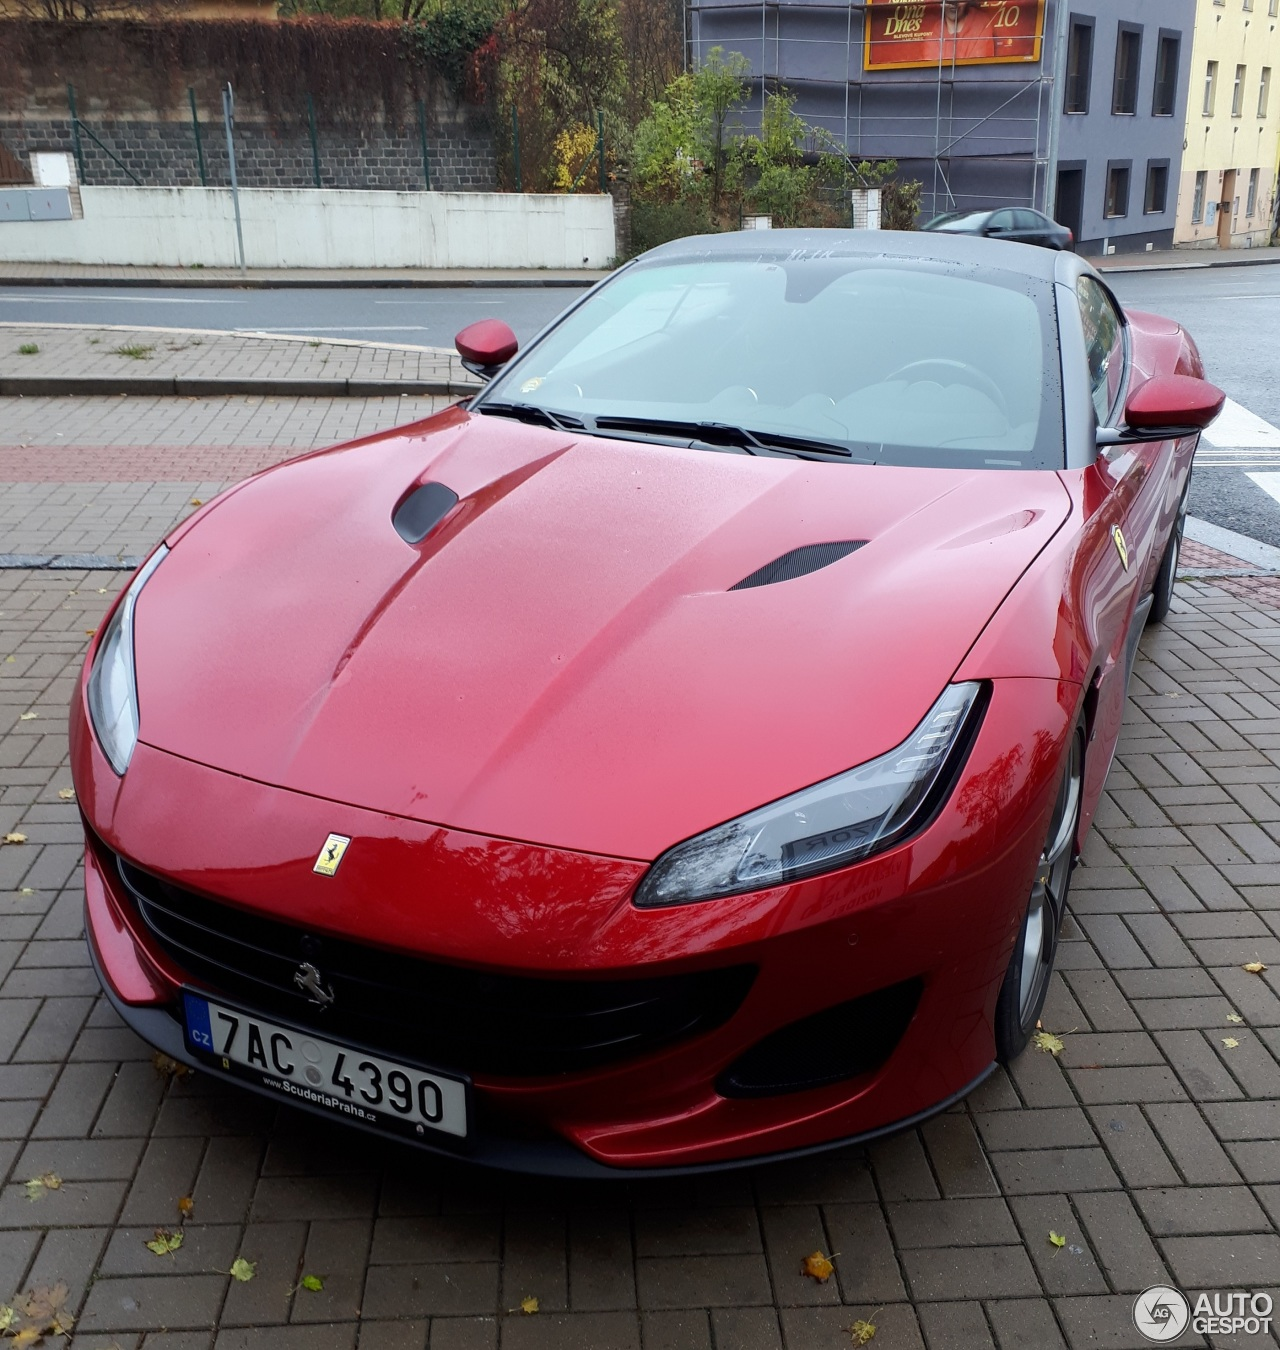 Portofino Car: Ferrari Portofino